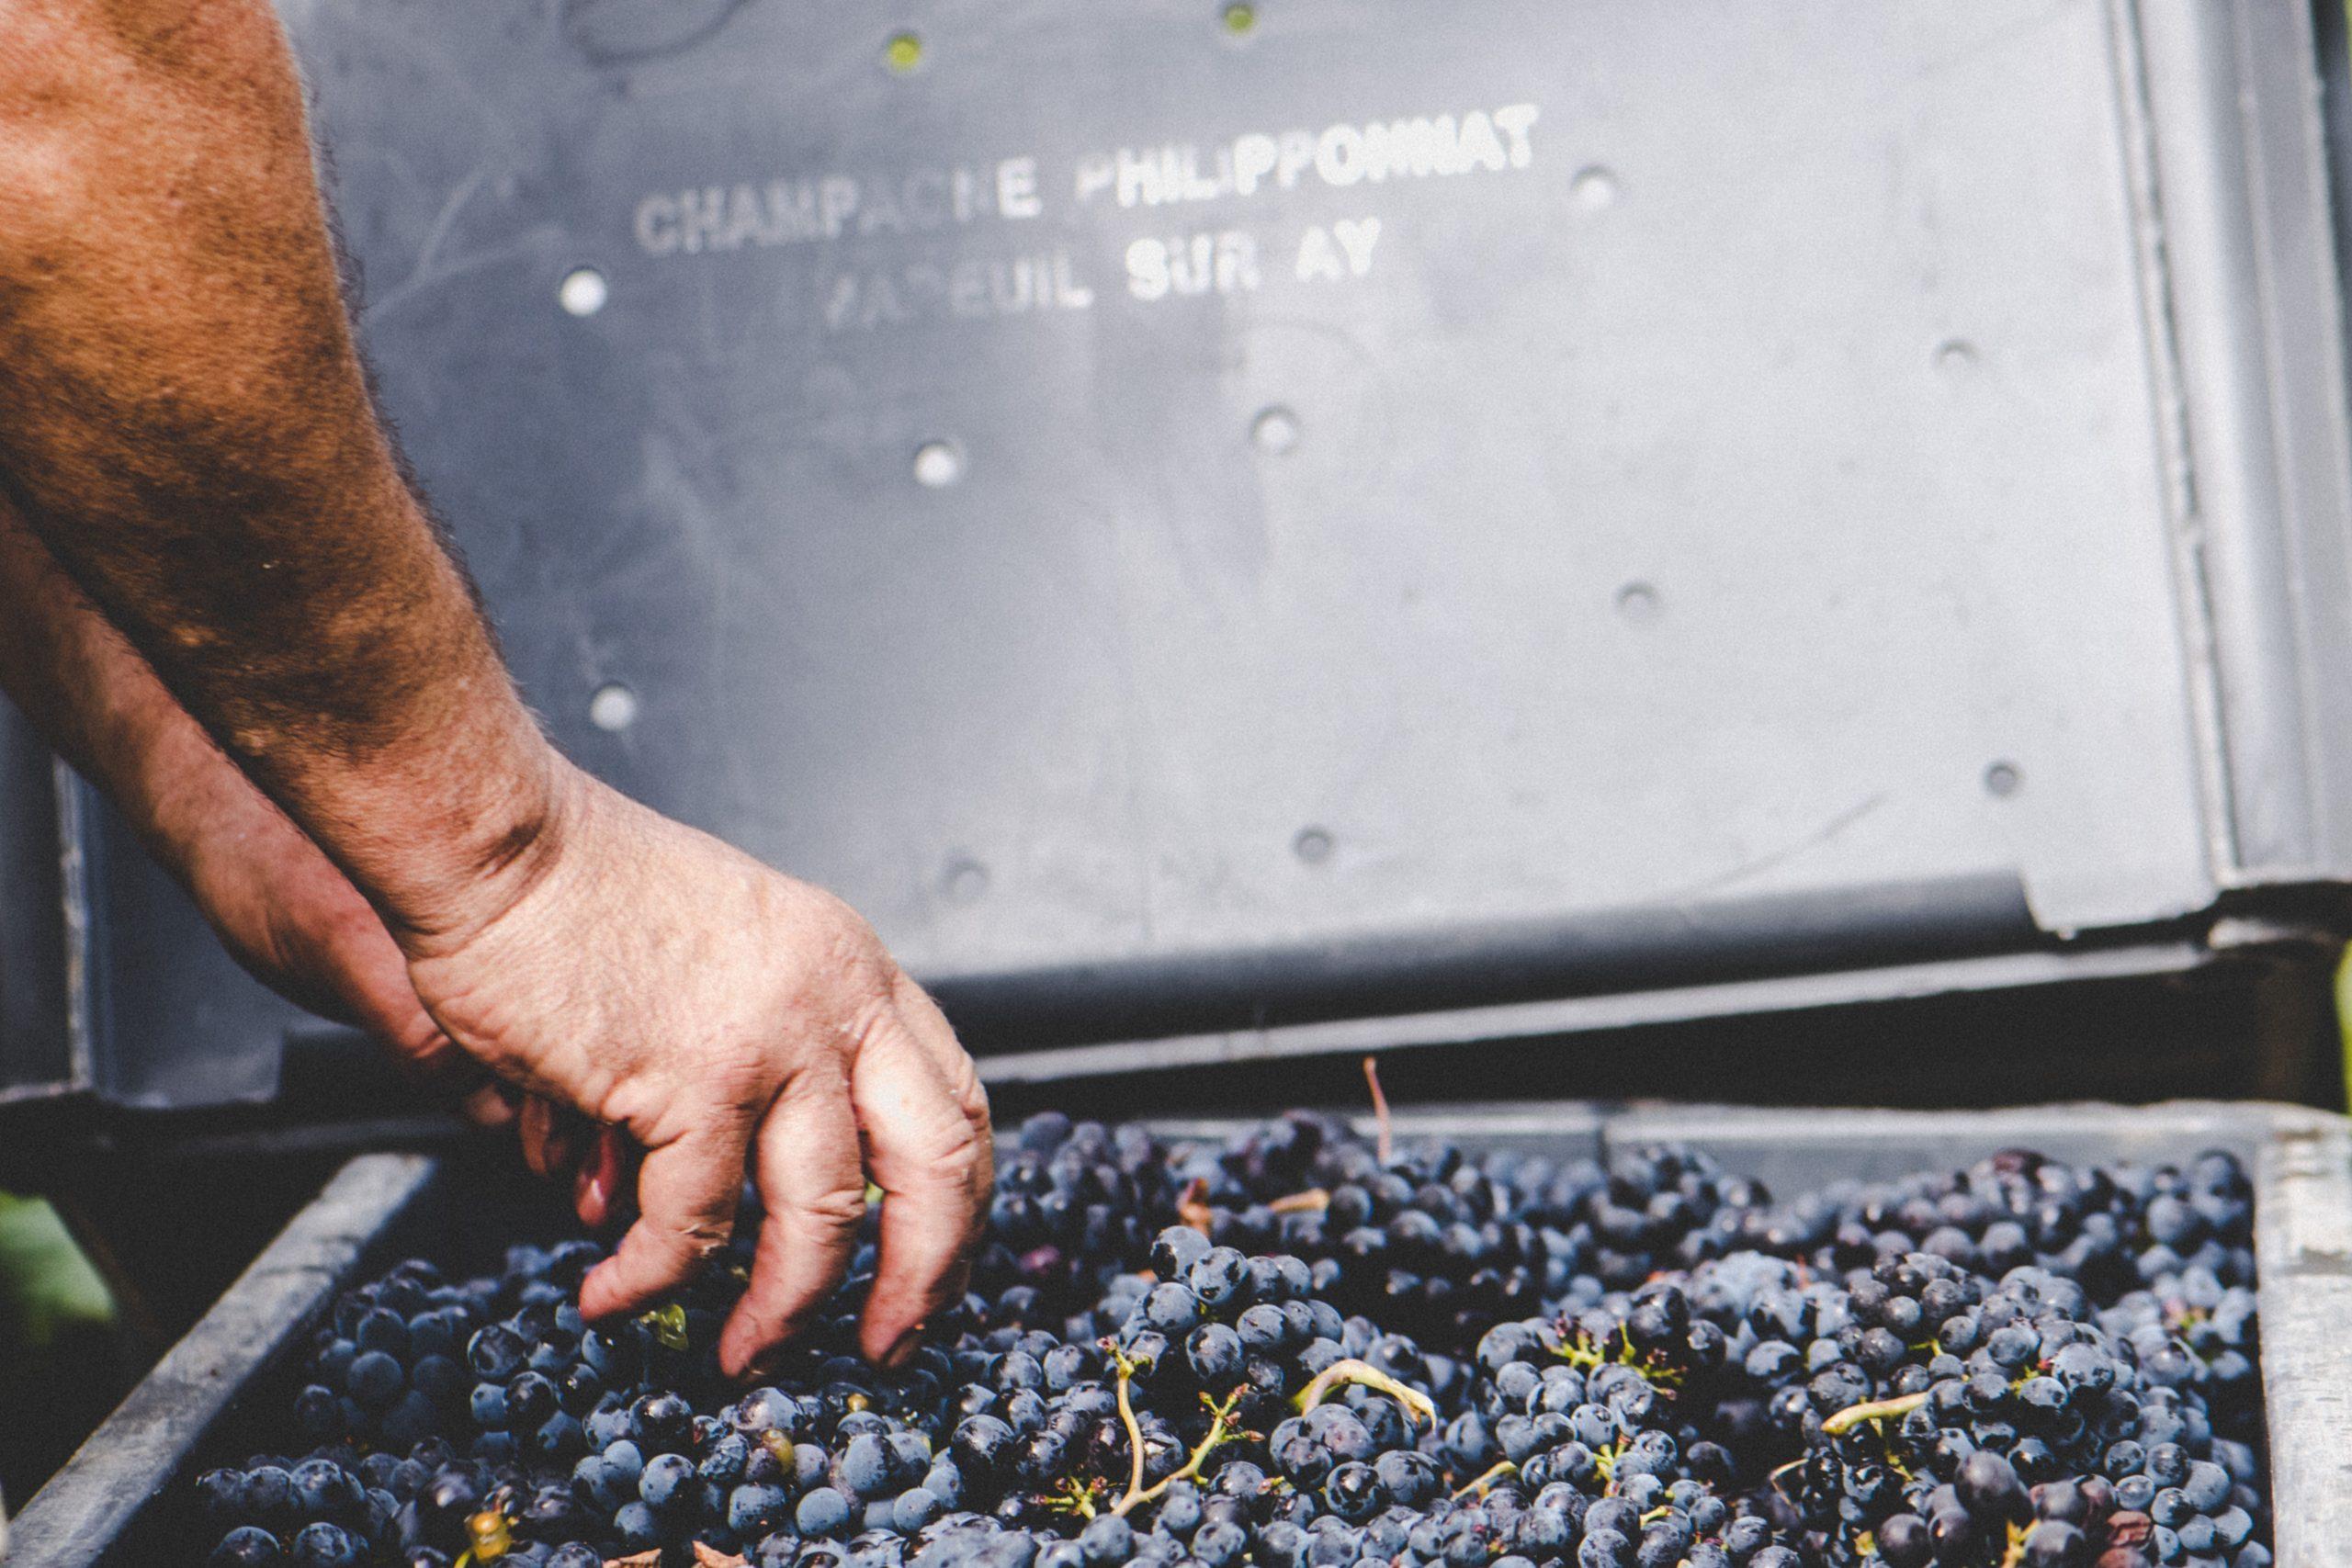 Coteaux Champenois Mareuil Rouge - Champagne Philipponnat